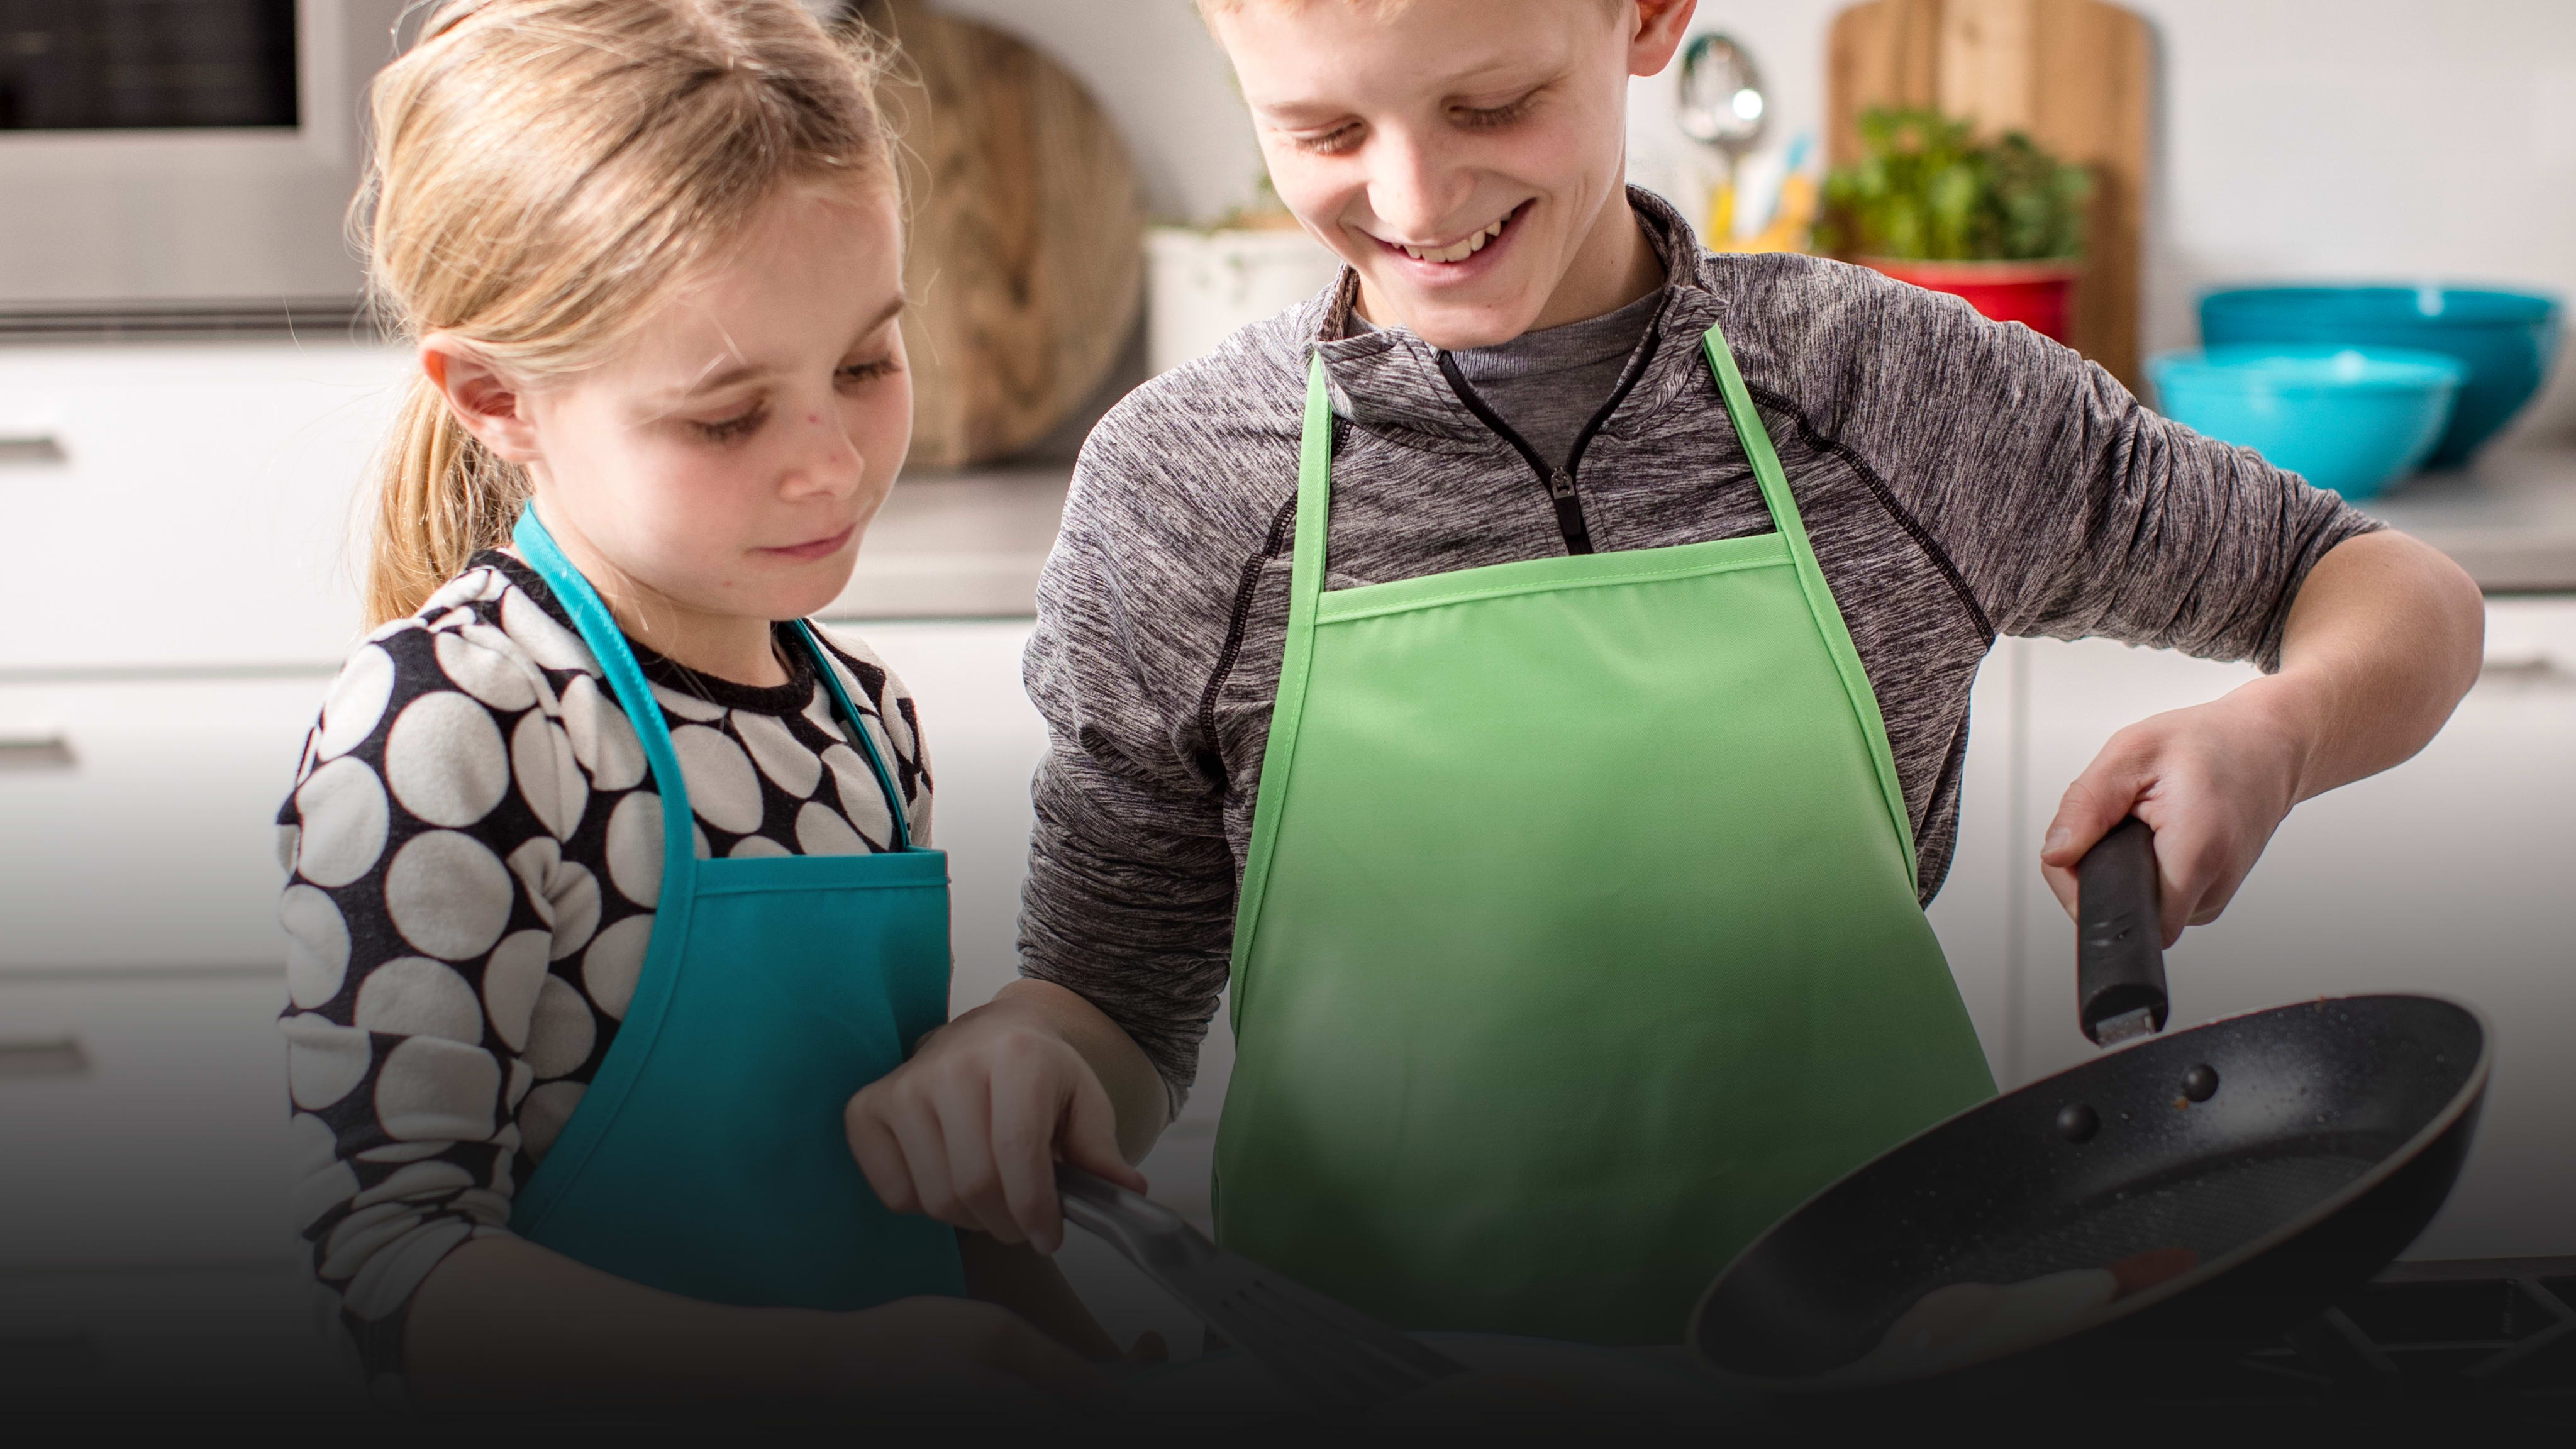 Kitchen Classroom 2021: Week 9